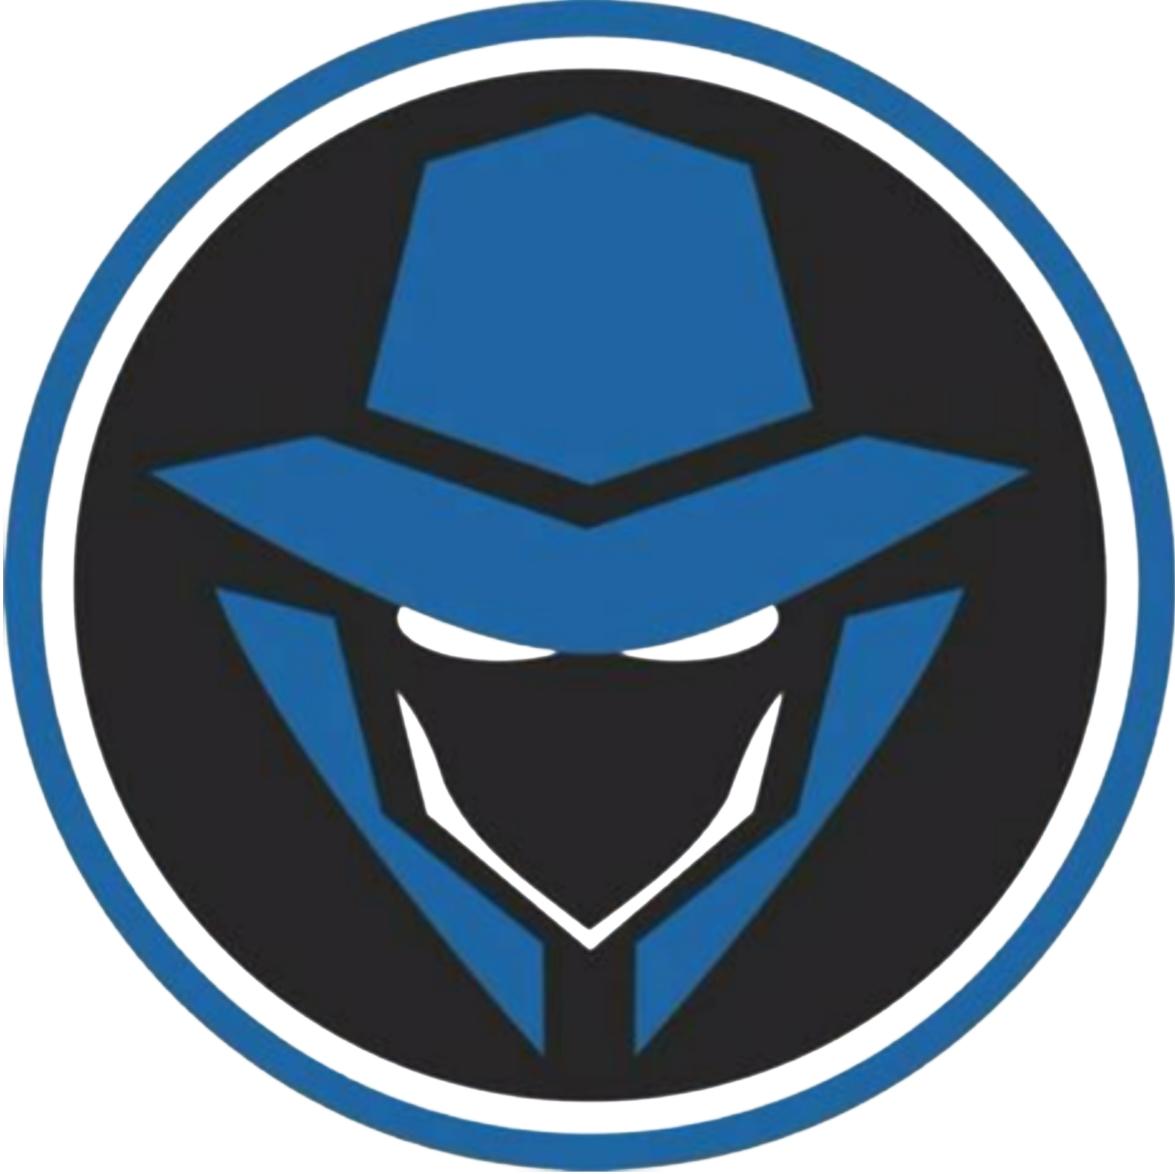 official hacker